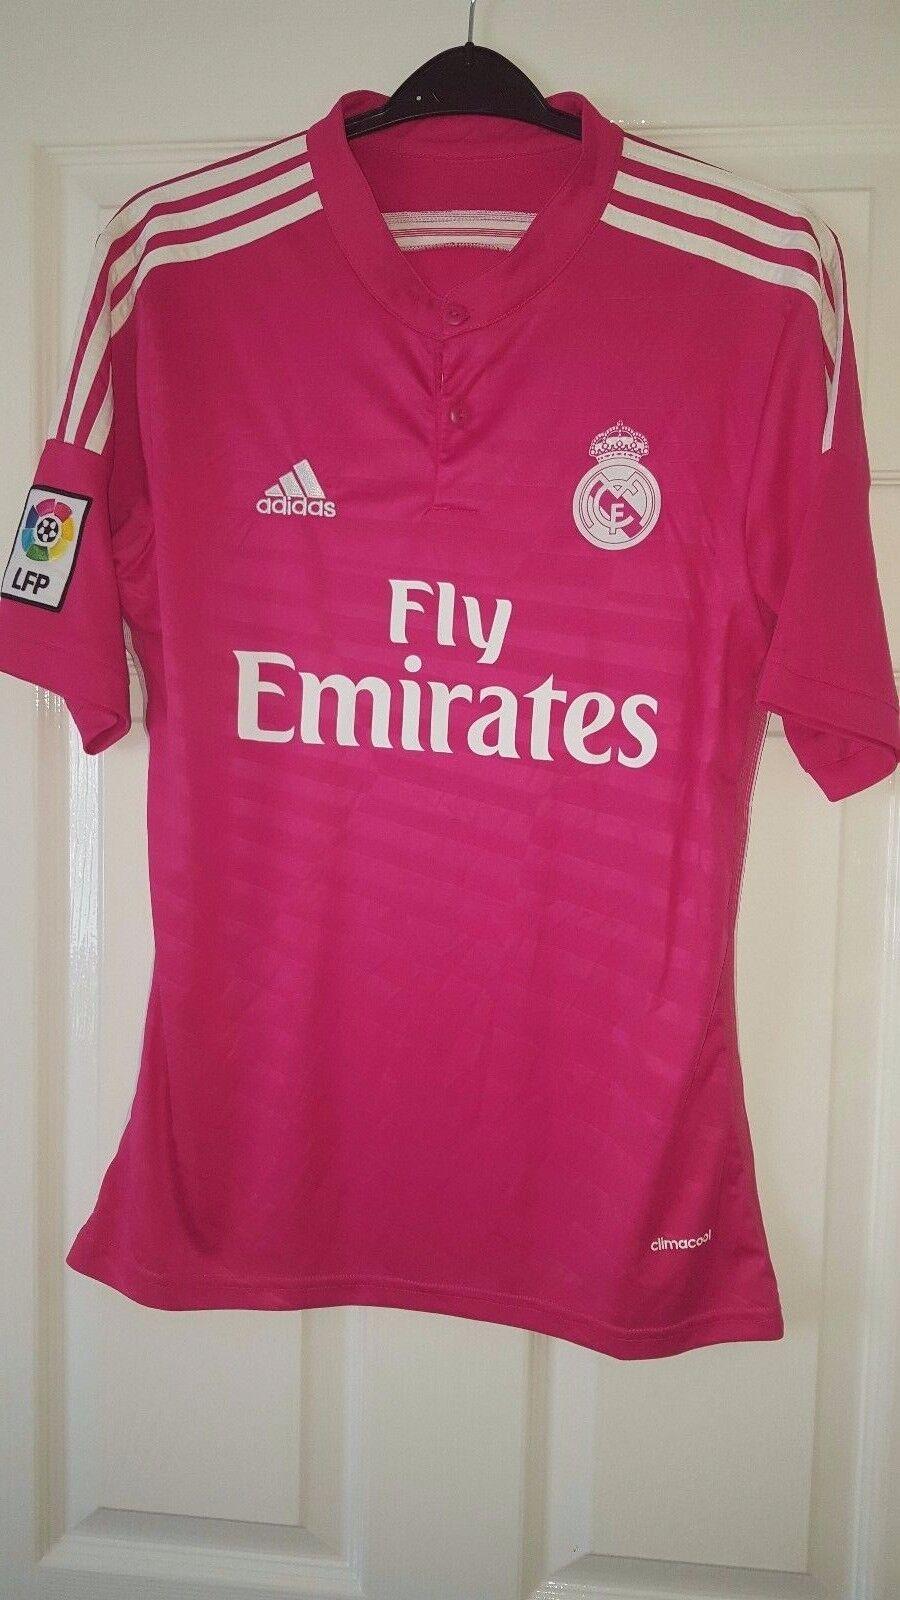 Mens Football Shirt - Real Madrid - Adidas - Away 2014-2015 - Fly Emirates -S